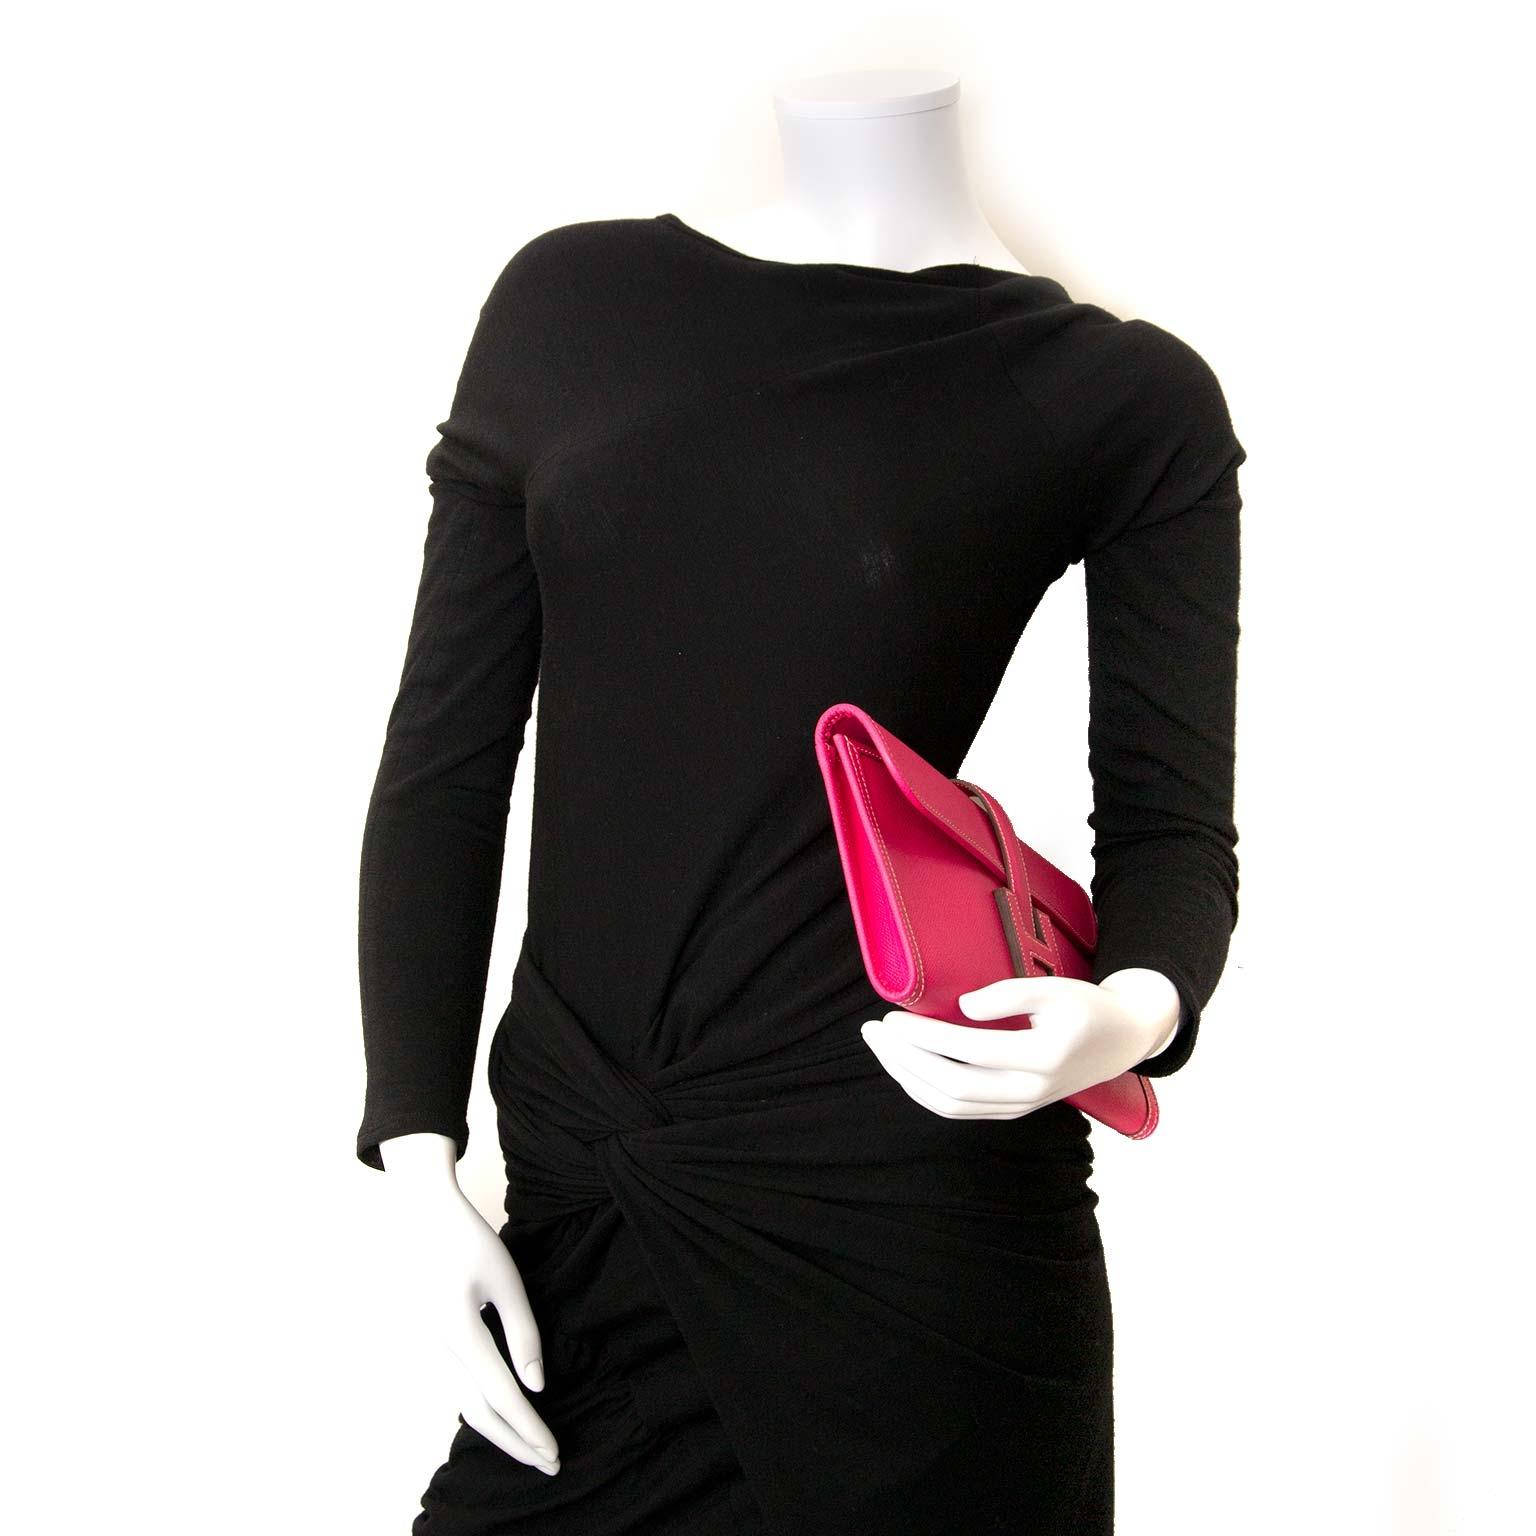 hermes jige elan 29 veau epsom rose tyrien clutch now for sale at labellov vintage fashion webshop belgium